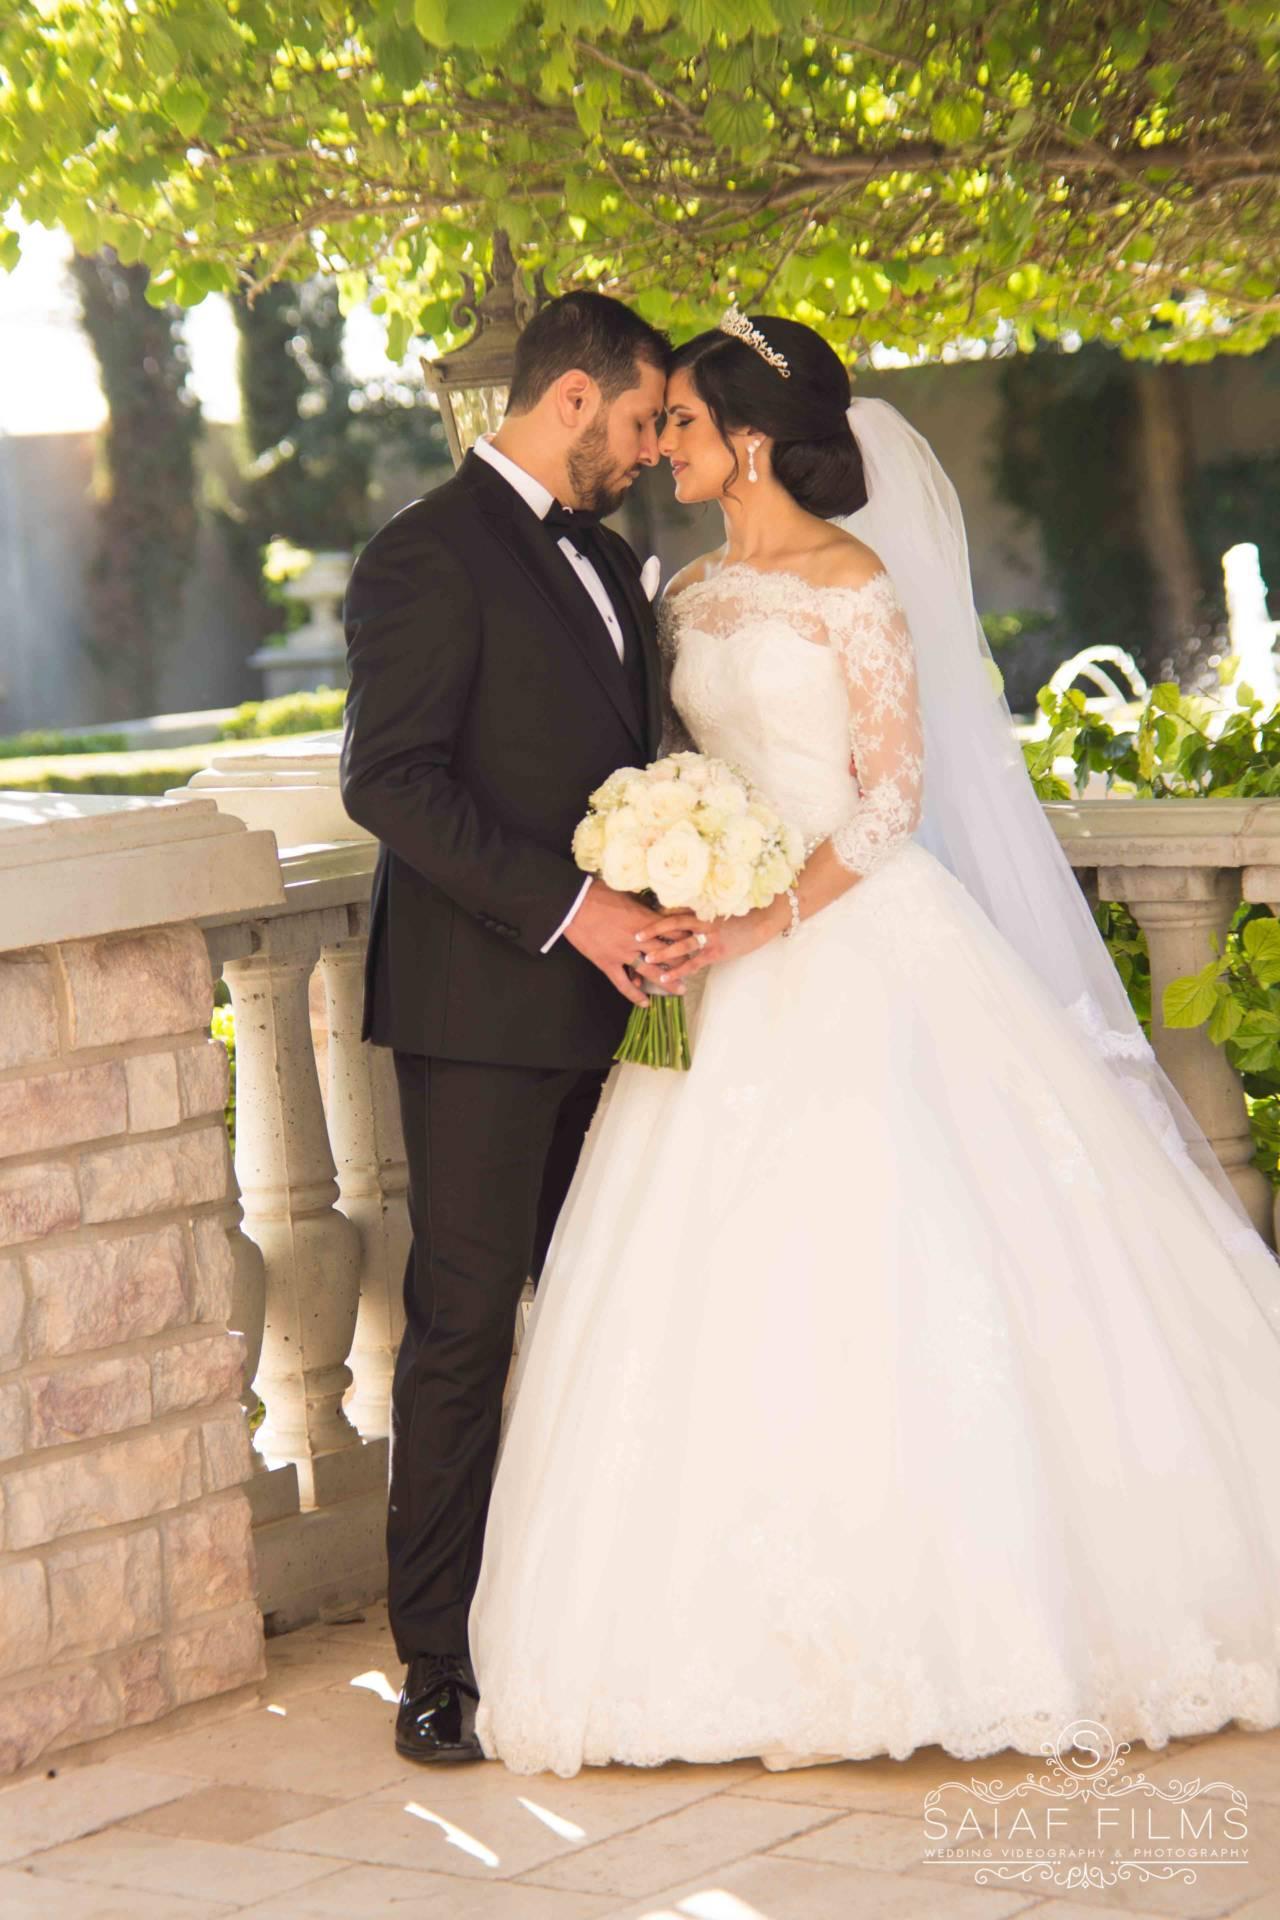 d84659c71cd Category » Muslim Wedding Photographer Archives - Saiaf FilmsSaiaf Films